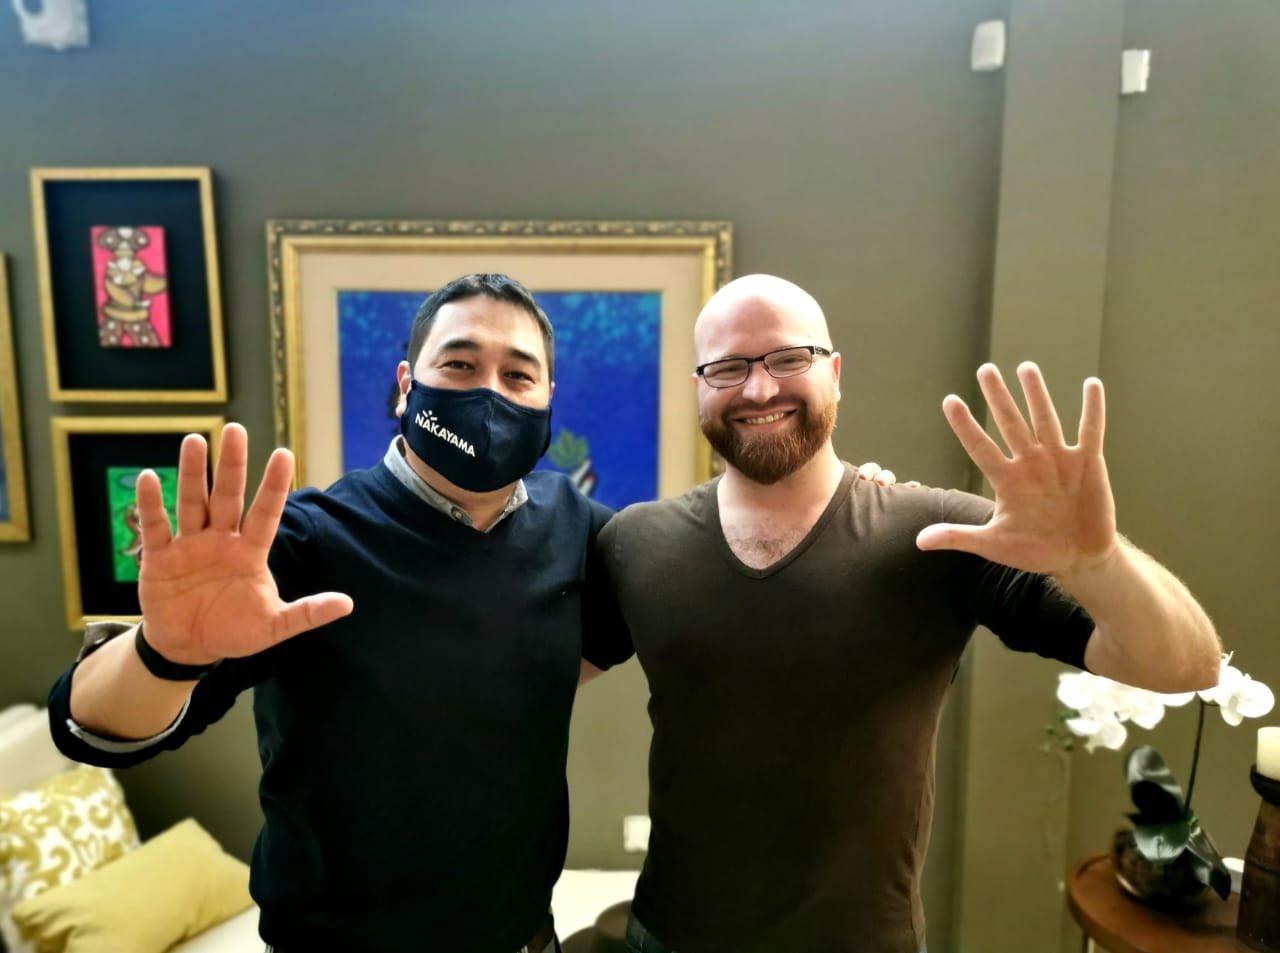 Grassi sumó su apoyo a Nakayama. (Foto Gentileza)